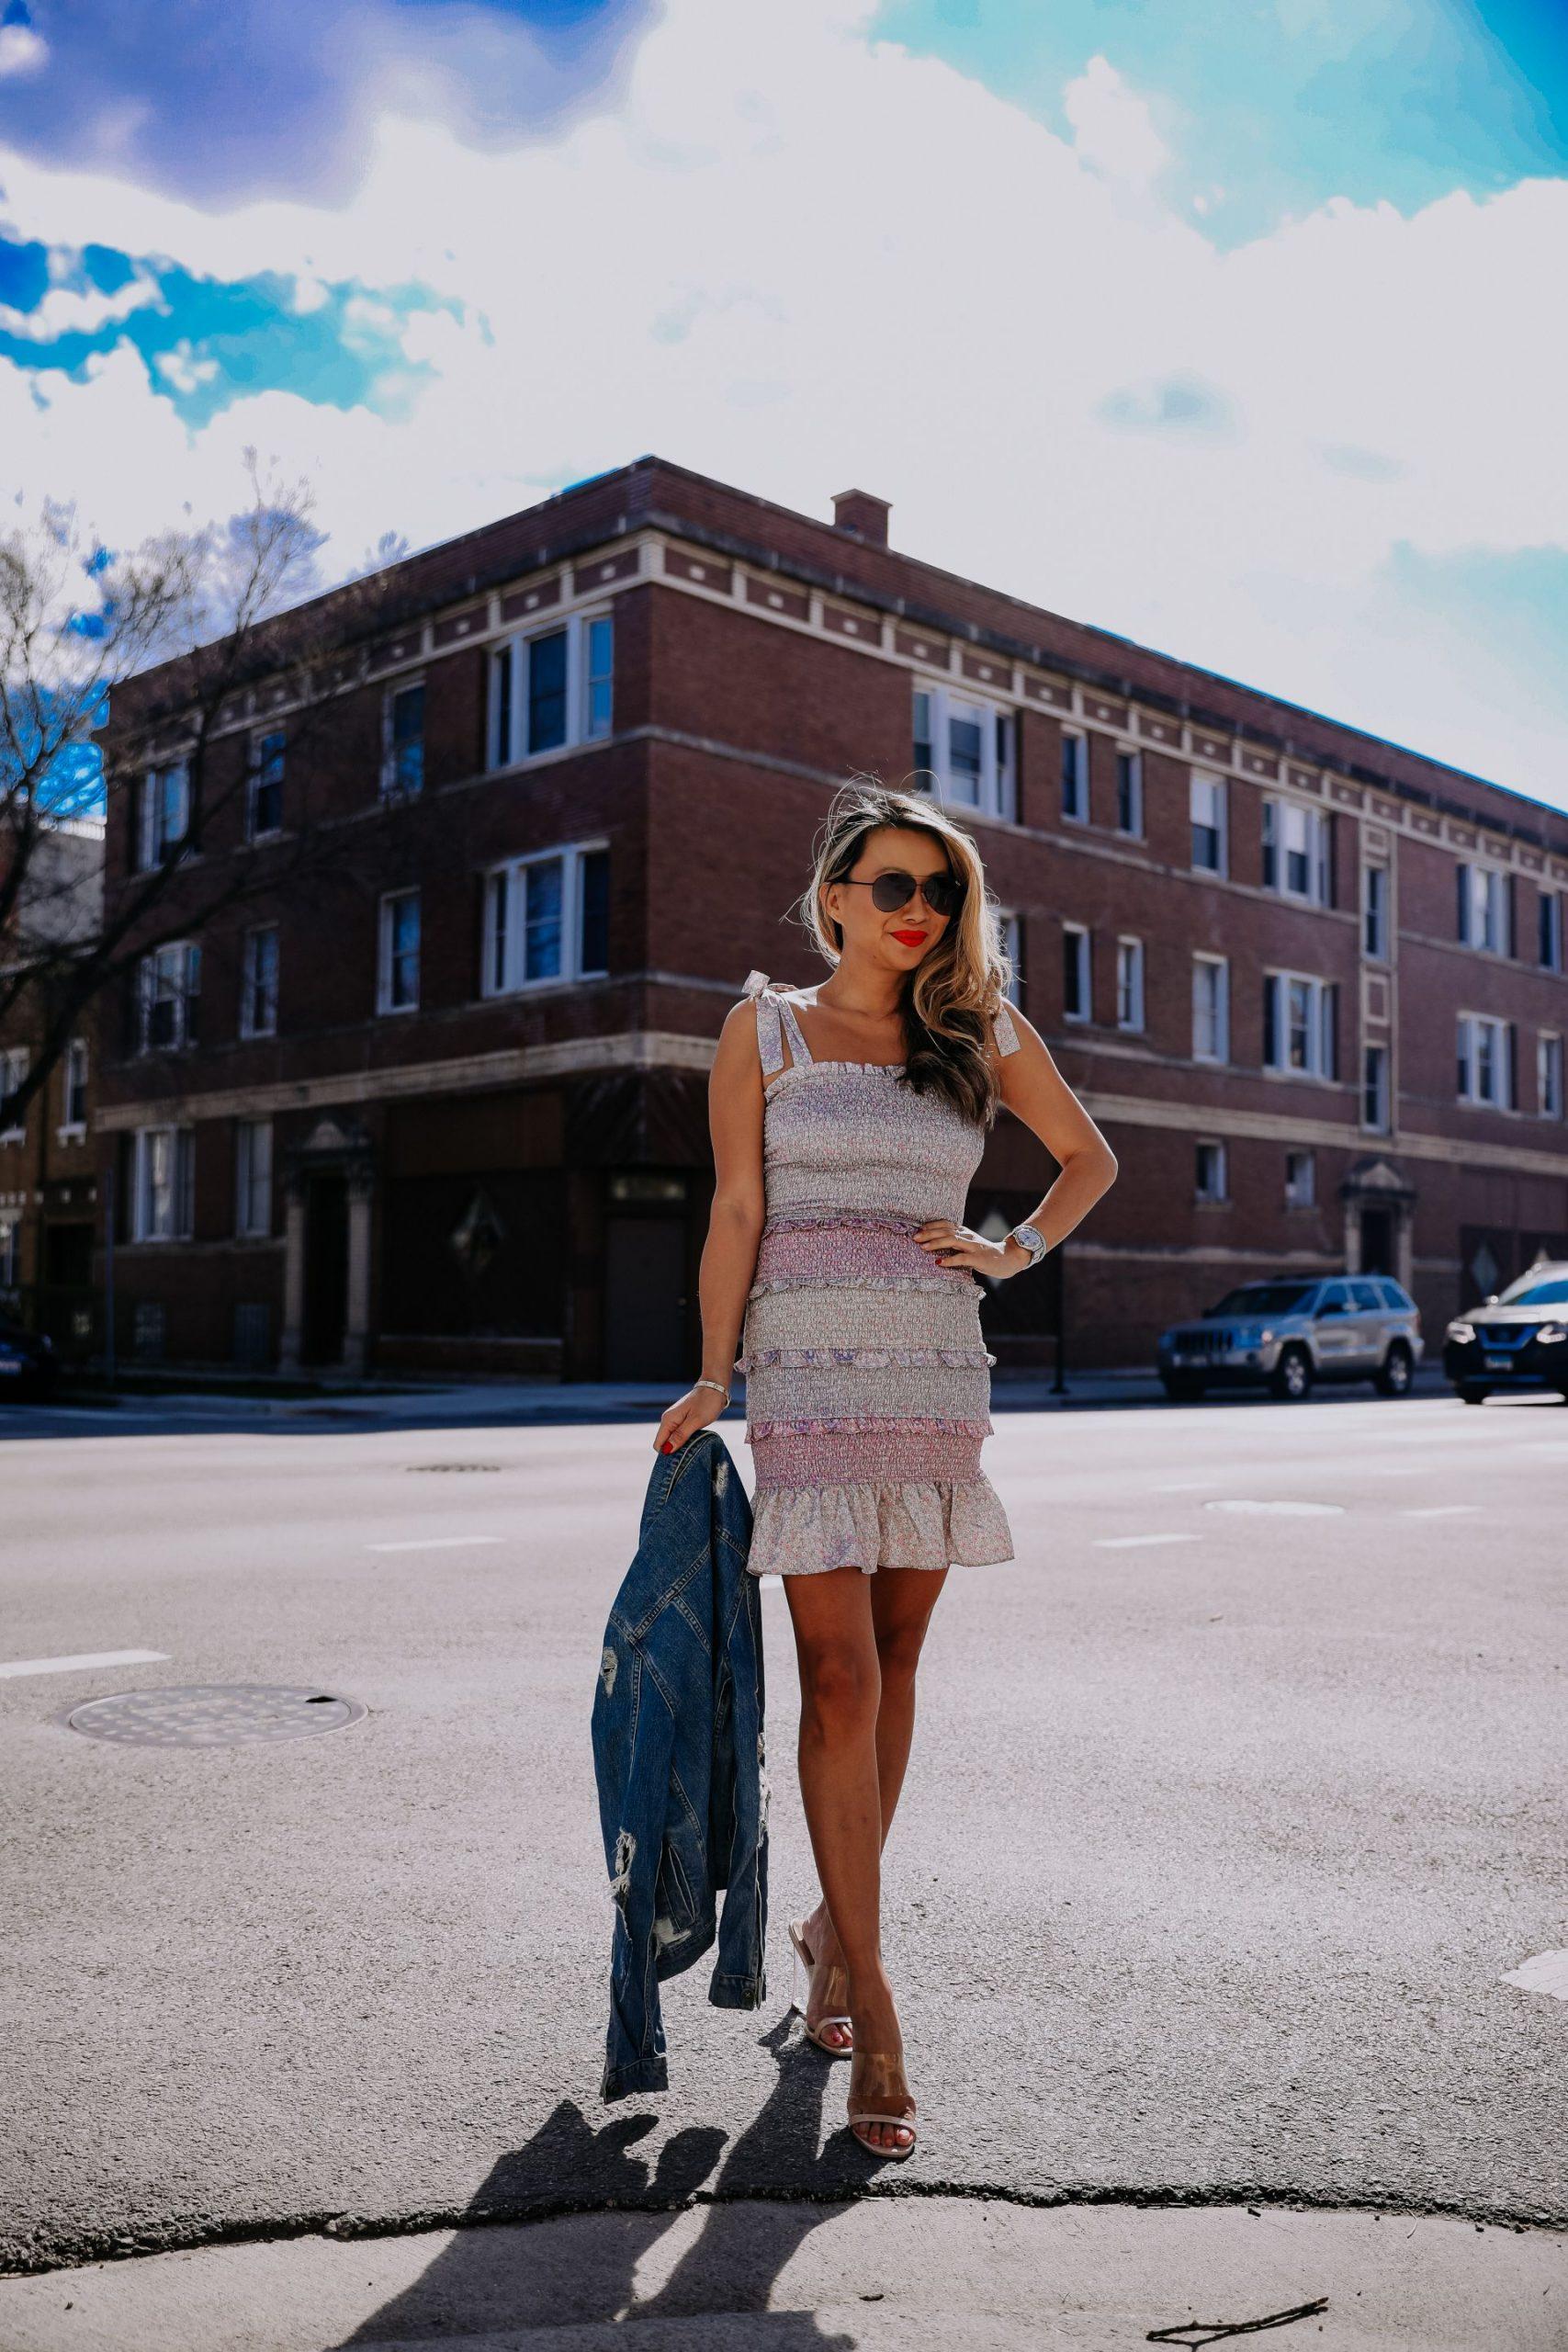 easy summer dresses under $100, fun dresses for Summer, colorful summer dresses, colorful dress outfit ideas, how to style a colorful dress for Summer, smocked dress red dress boutique